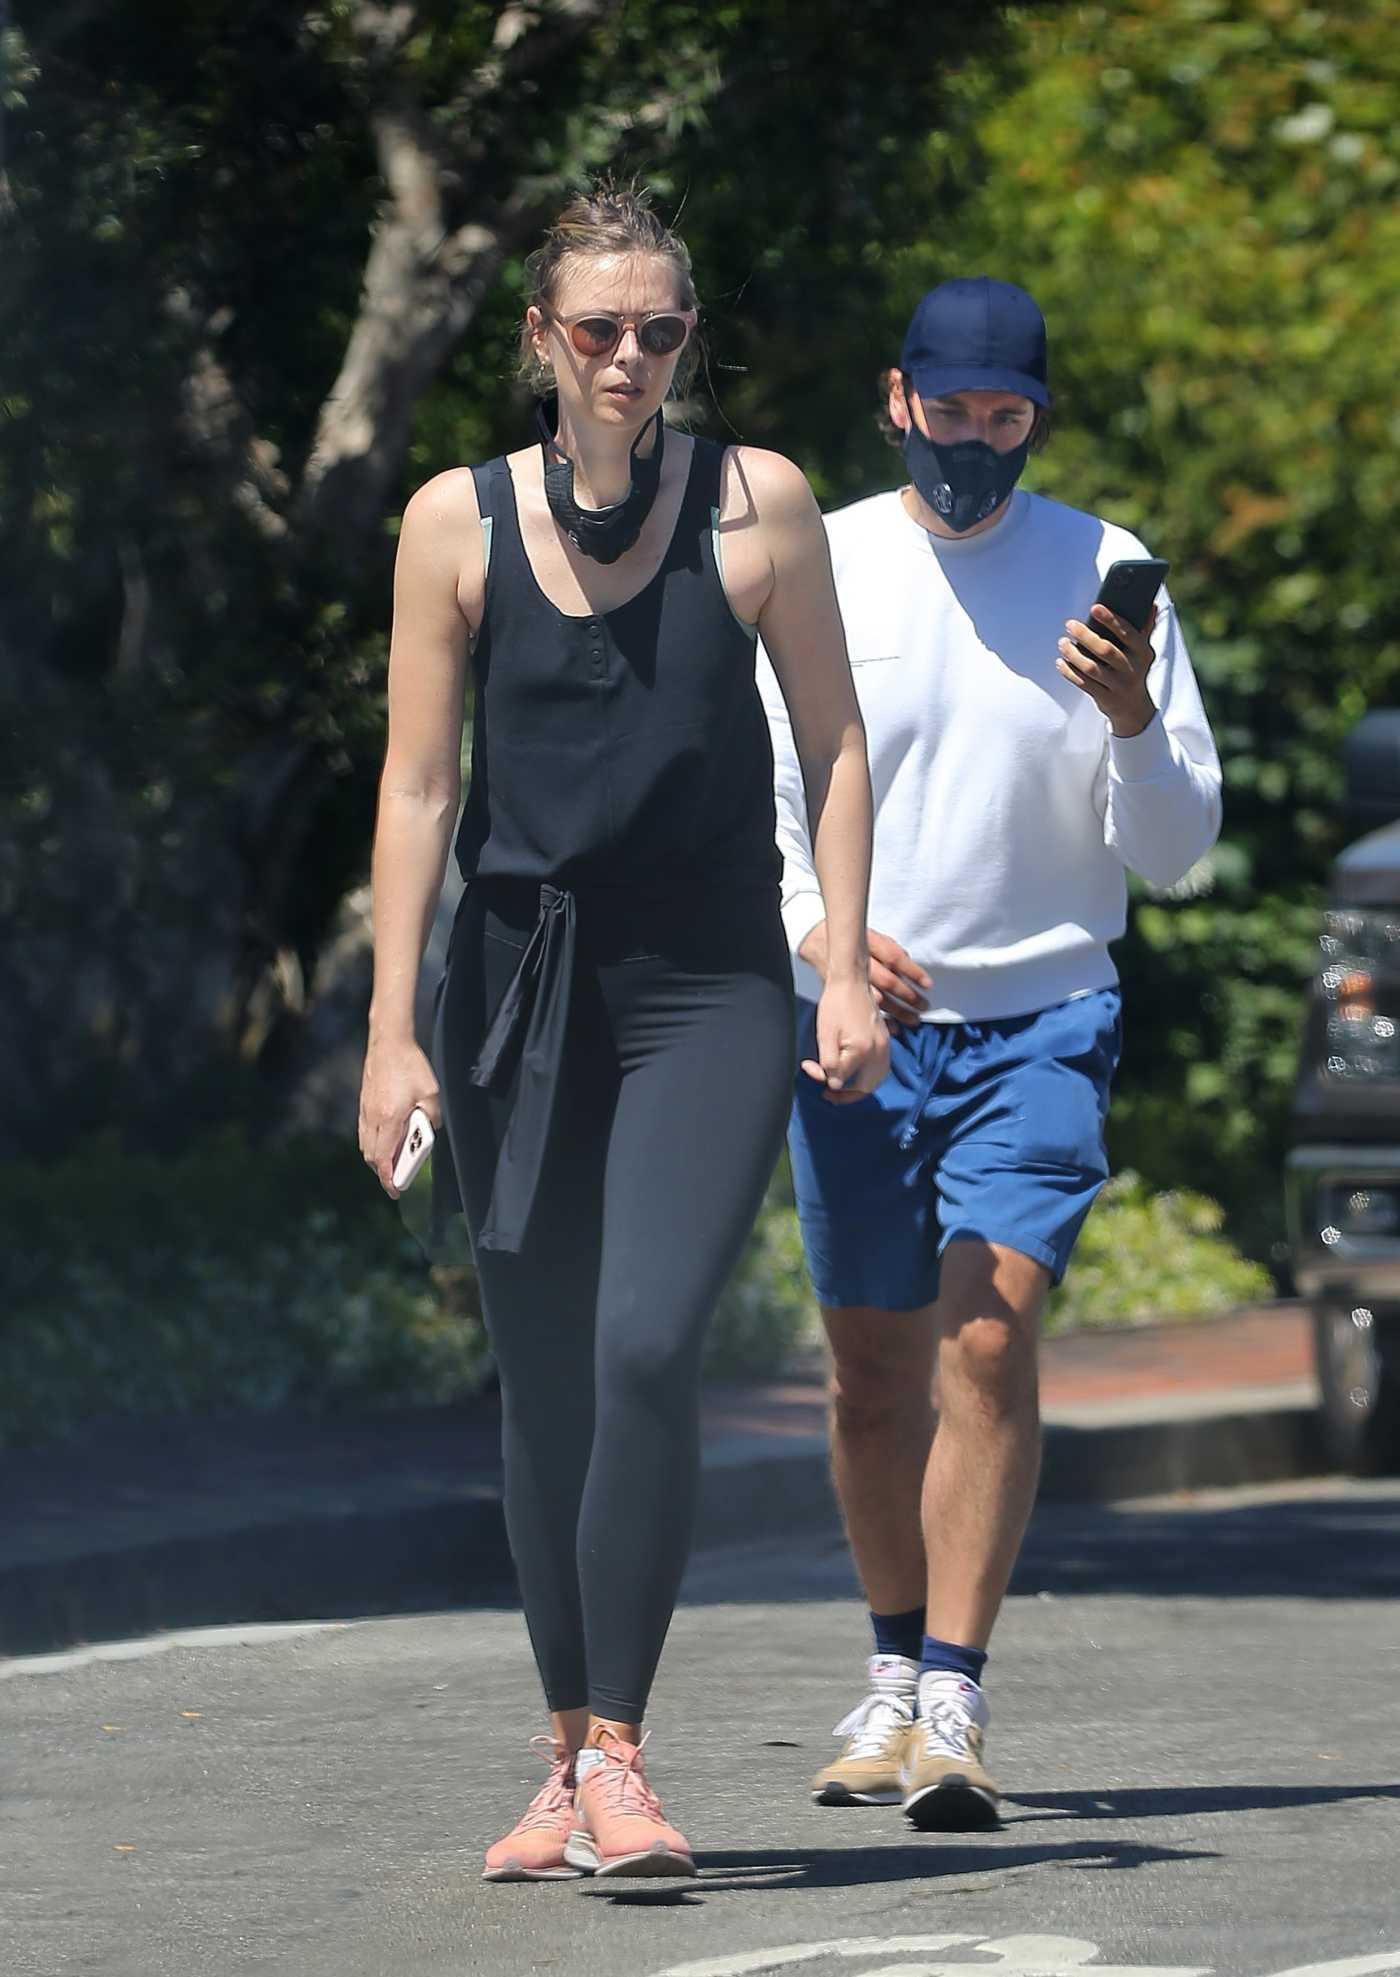 Maria Sharapova in a Black Leggings Was Spotted Near Her Manhattan Beach Home in Los Angeles 05/16/2020